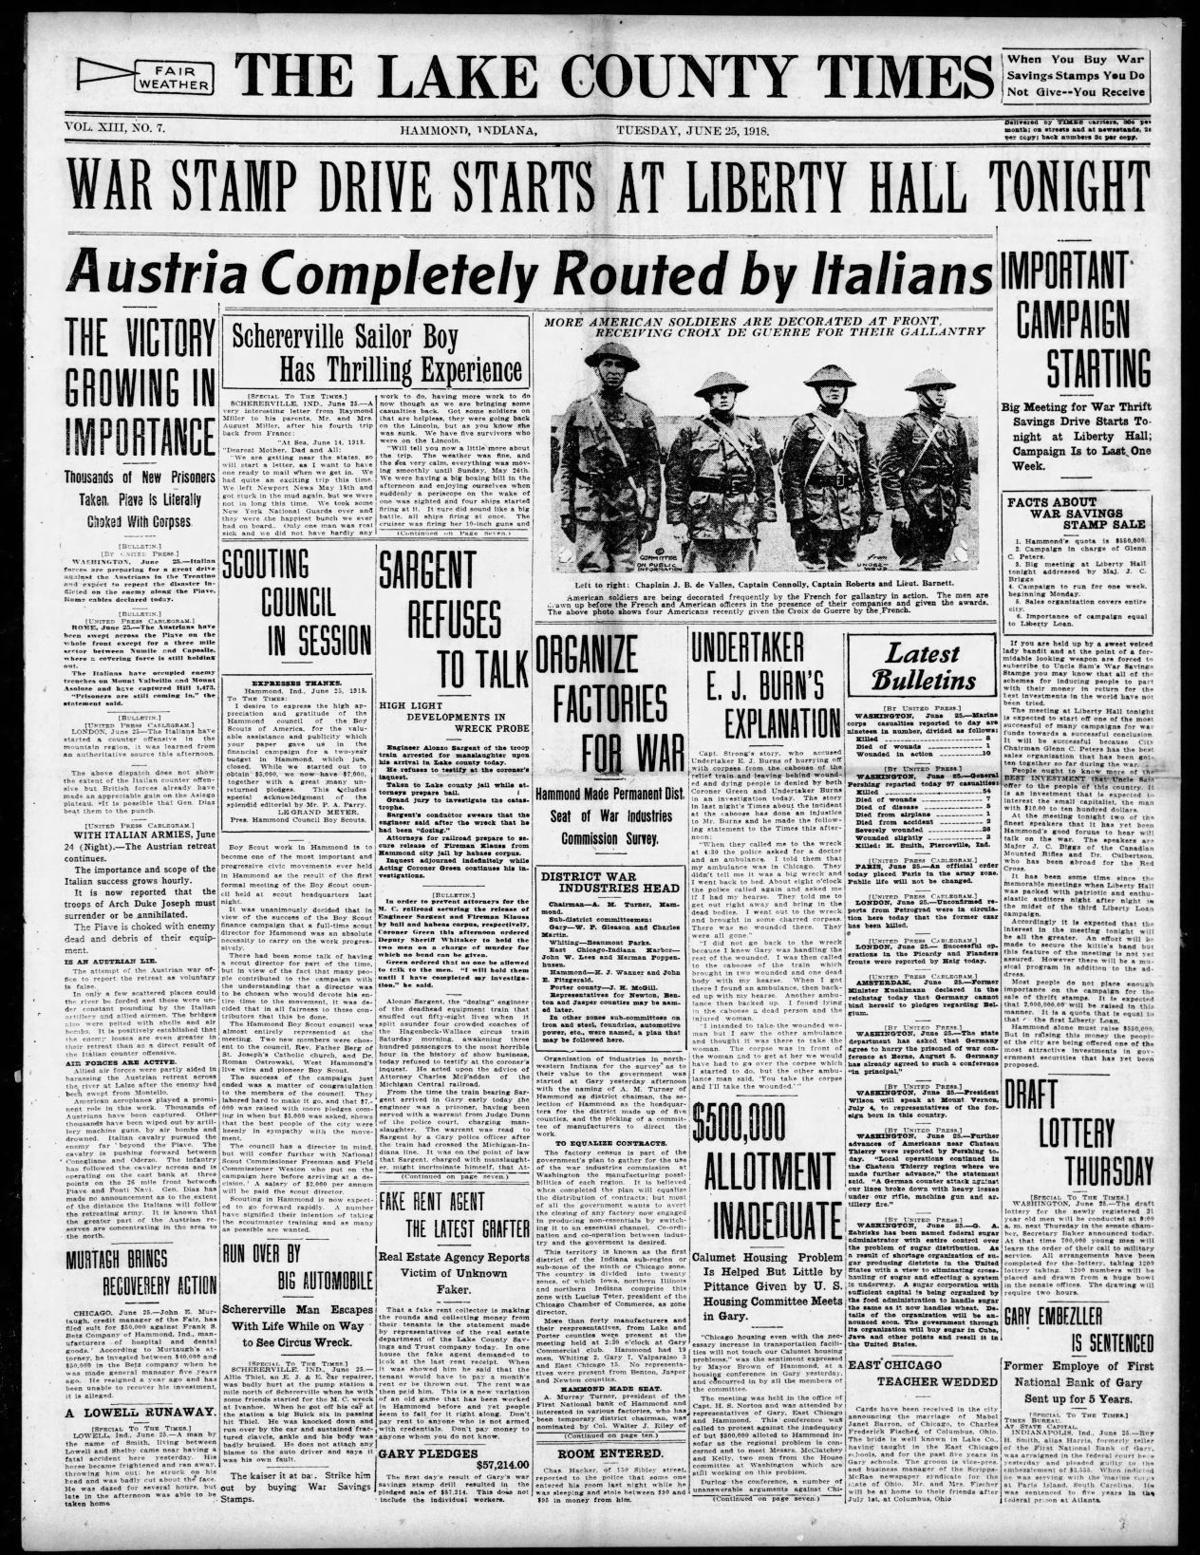 June 25, 1918: Schererville Sailor Boy Has Thrilling Experience